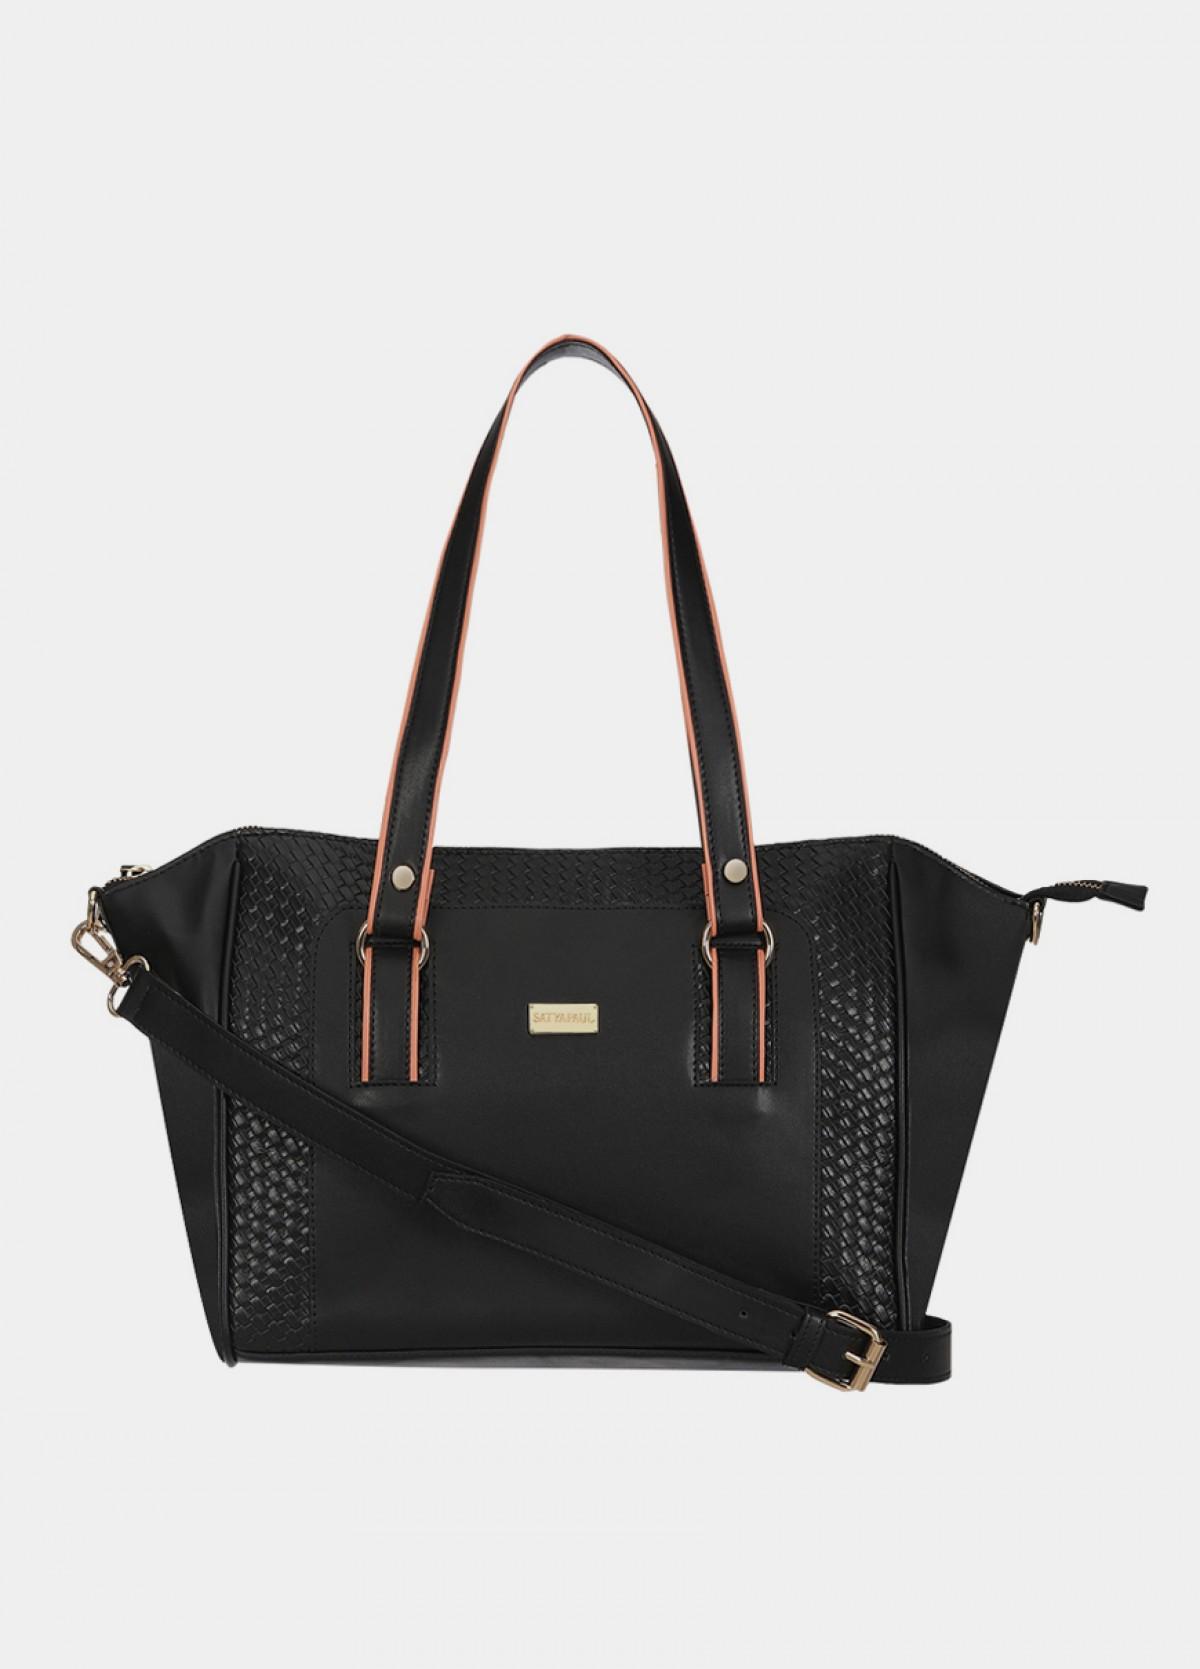 The Satyapaul Women Fashion Black Hand Bag